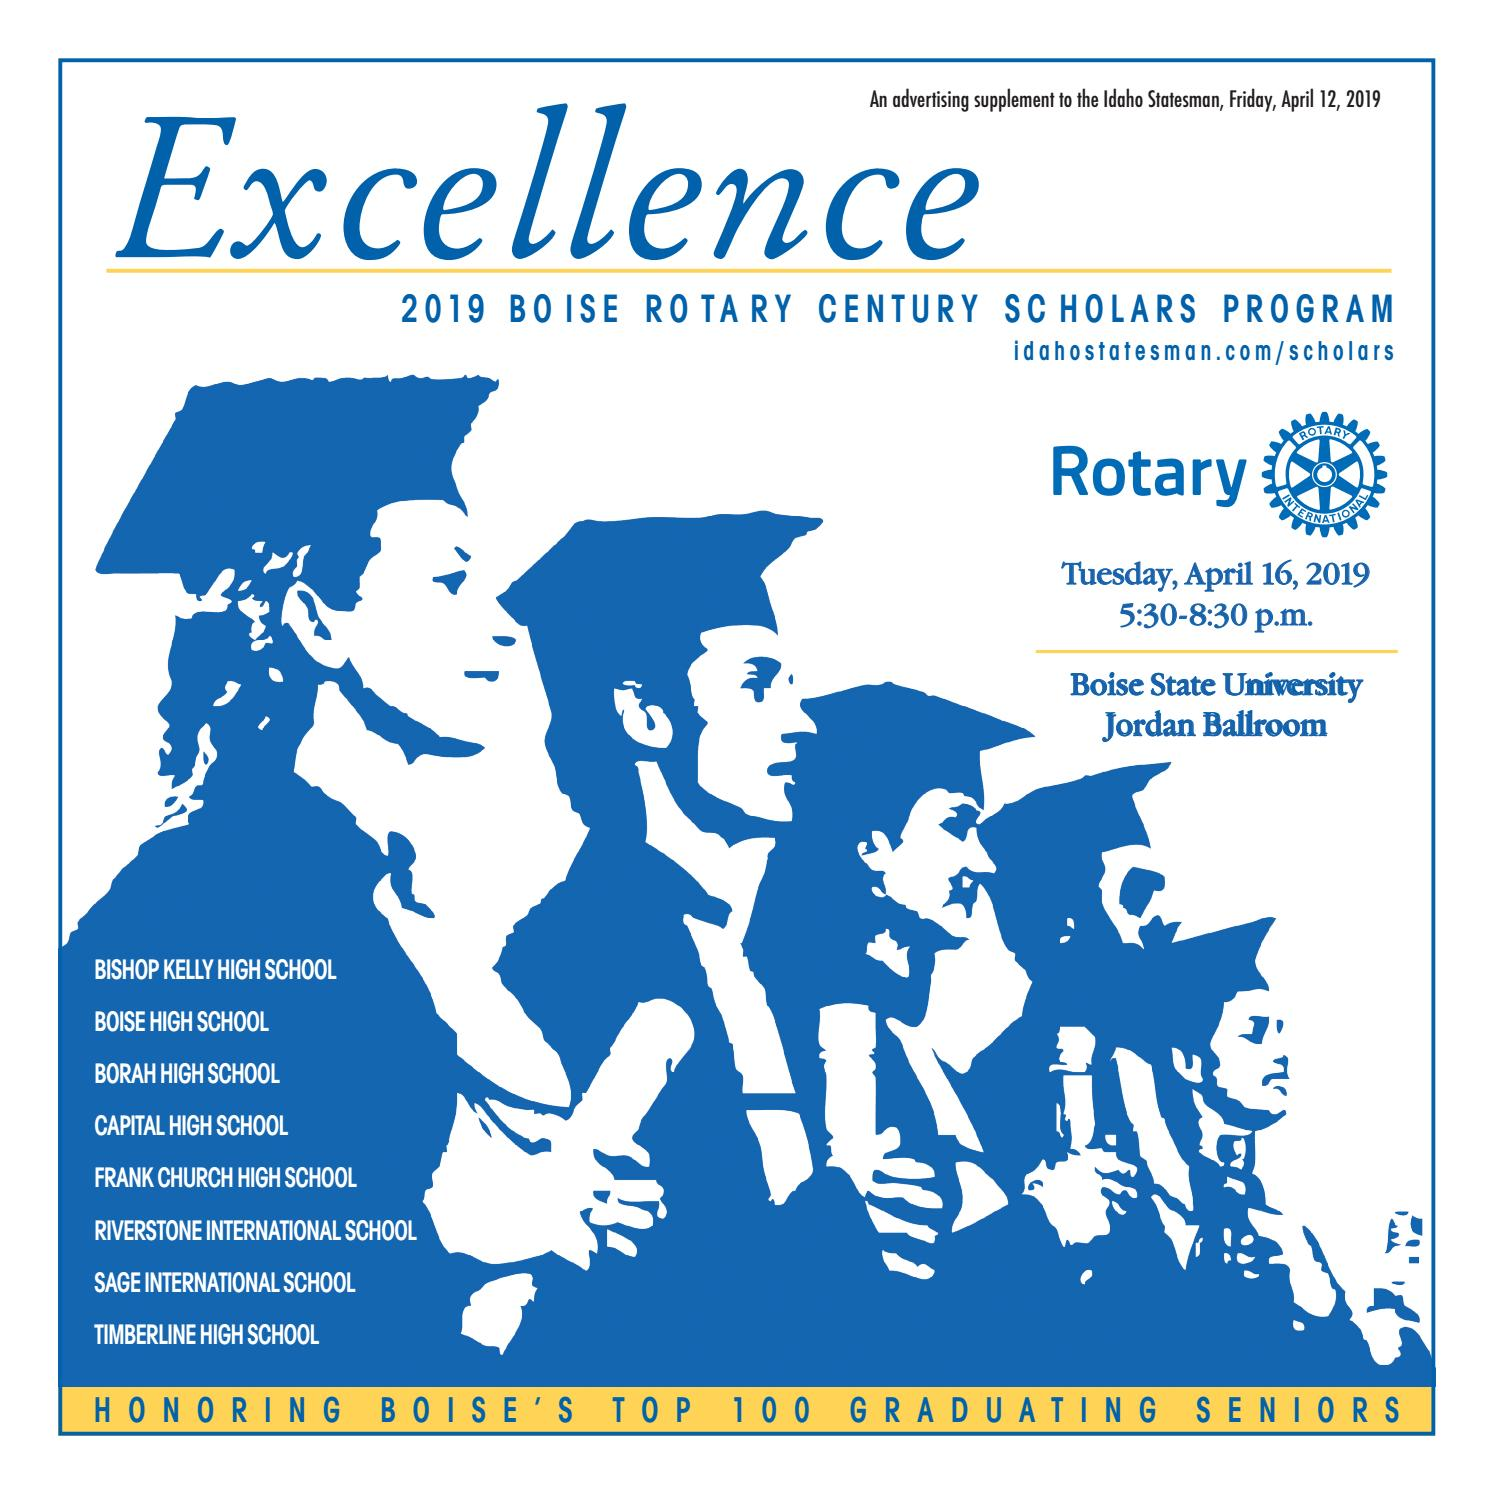 2019 Boise Rotary Scholars by Idaho Statesman - issuu